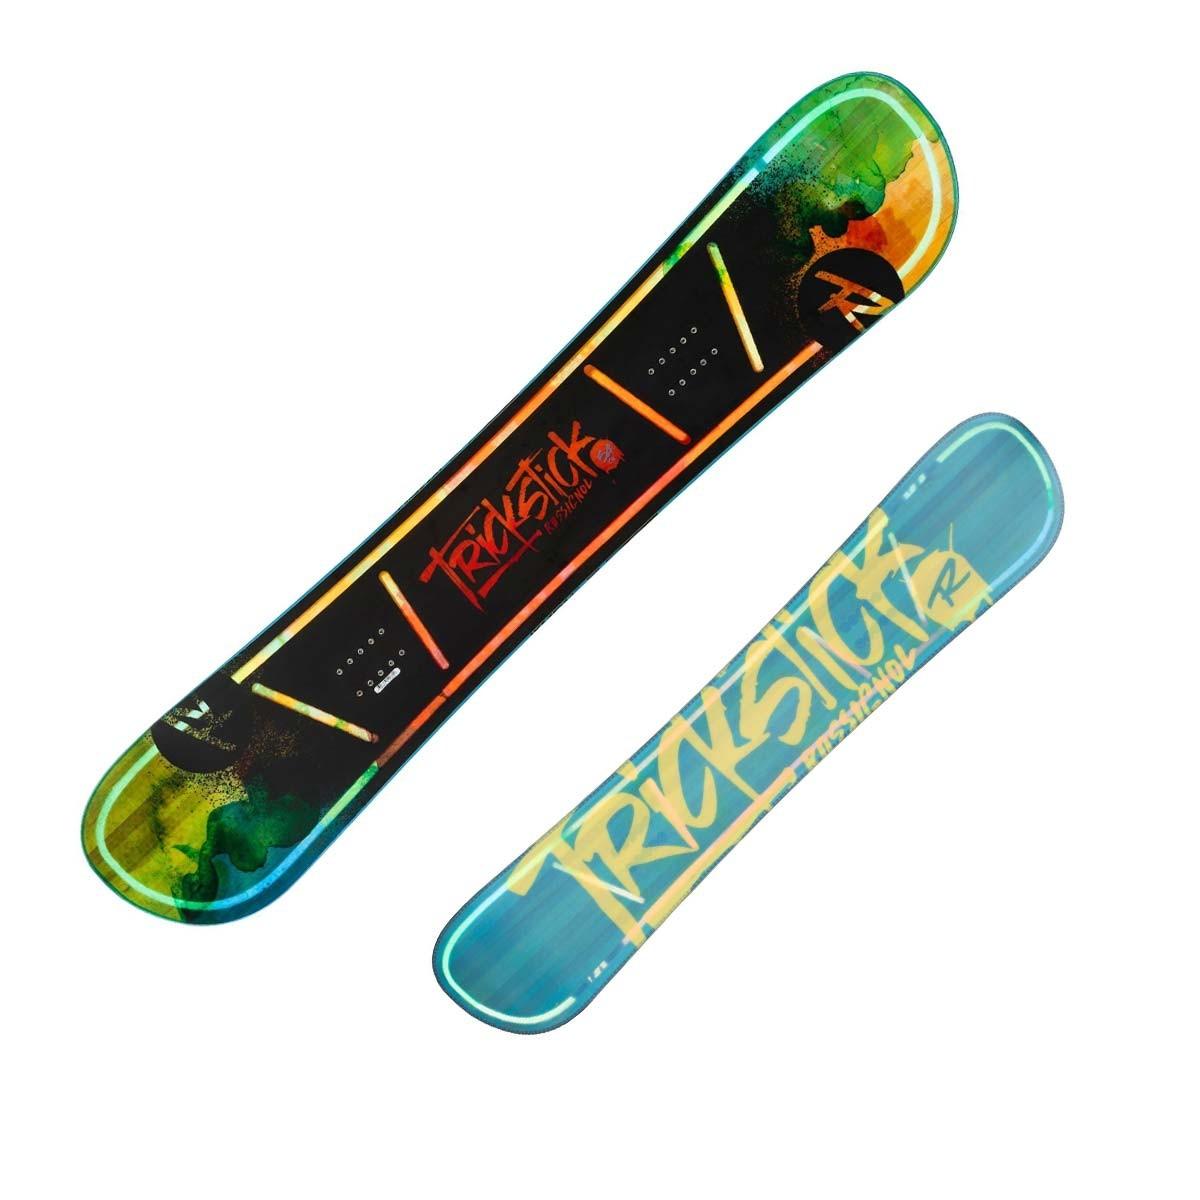 Snowboard Rossignol Trickstick Af Wide da uomo (Colore: fantasia, Taglia: 158)